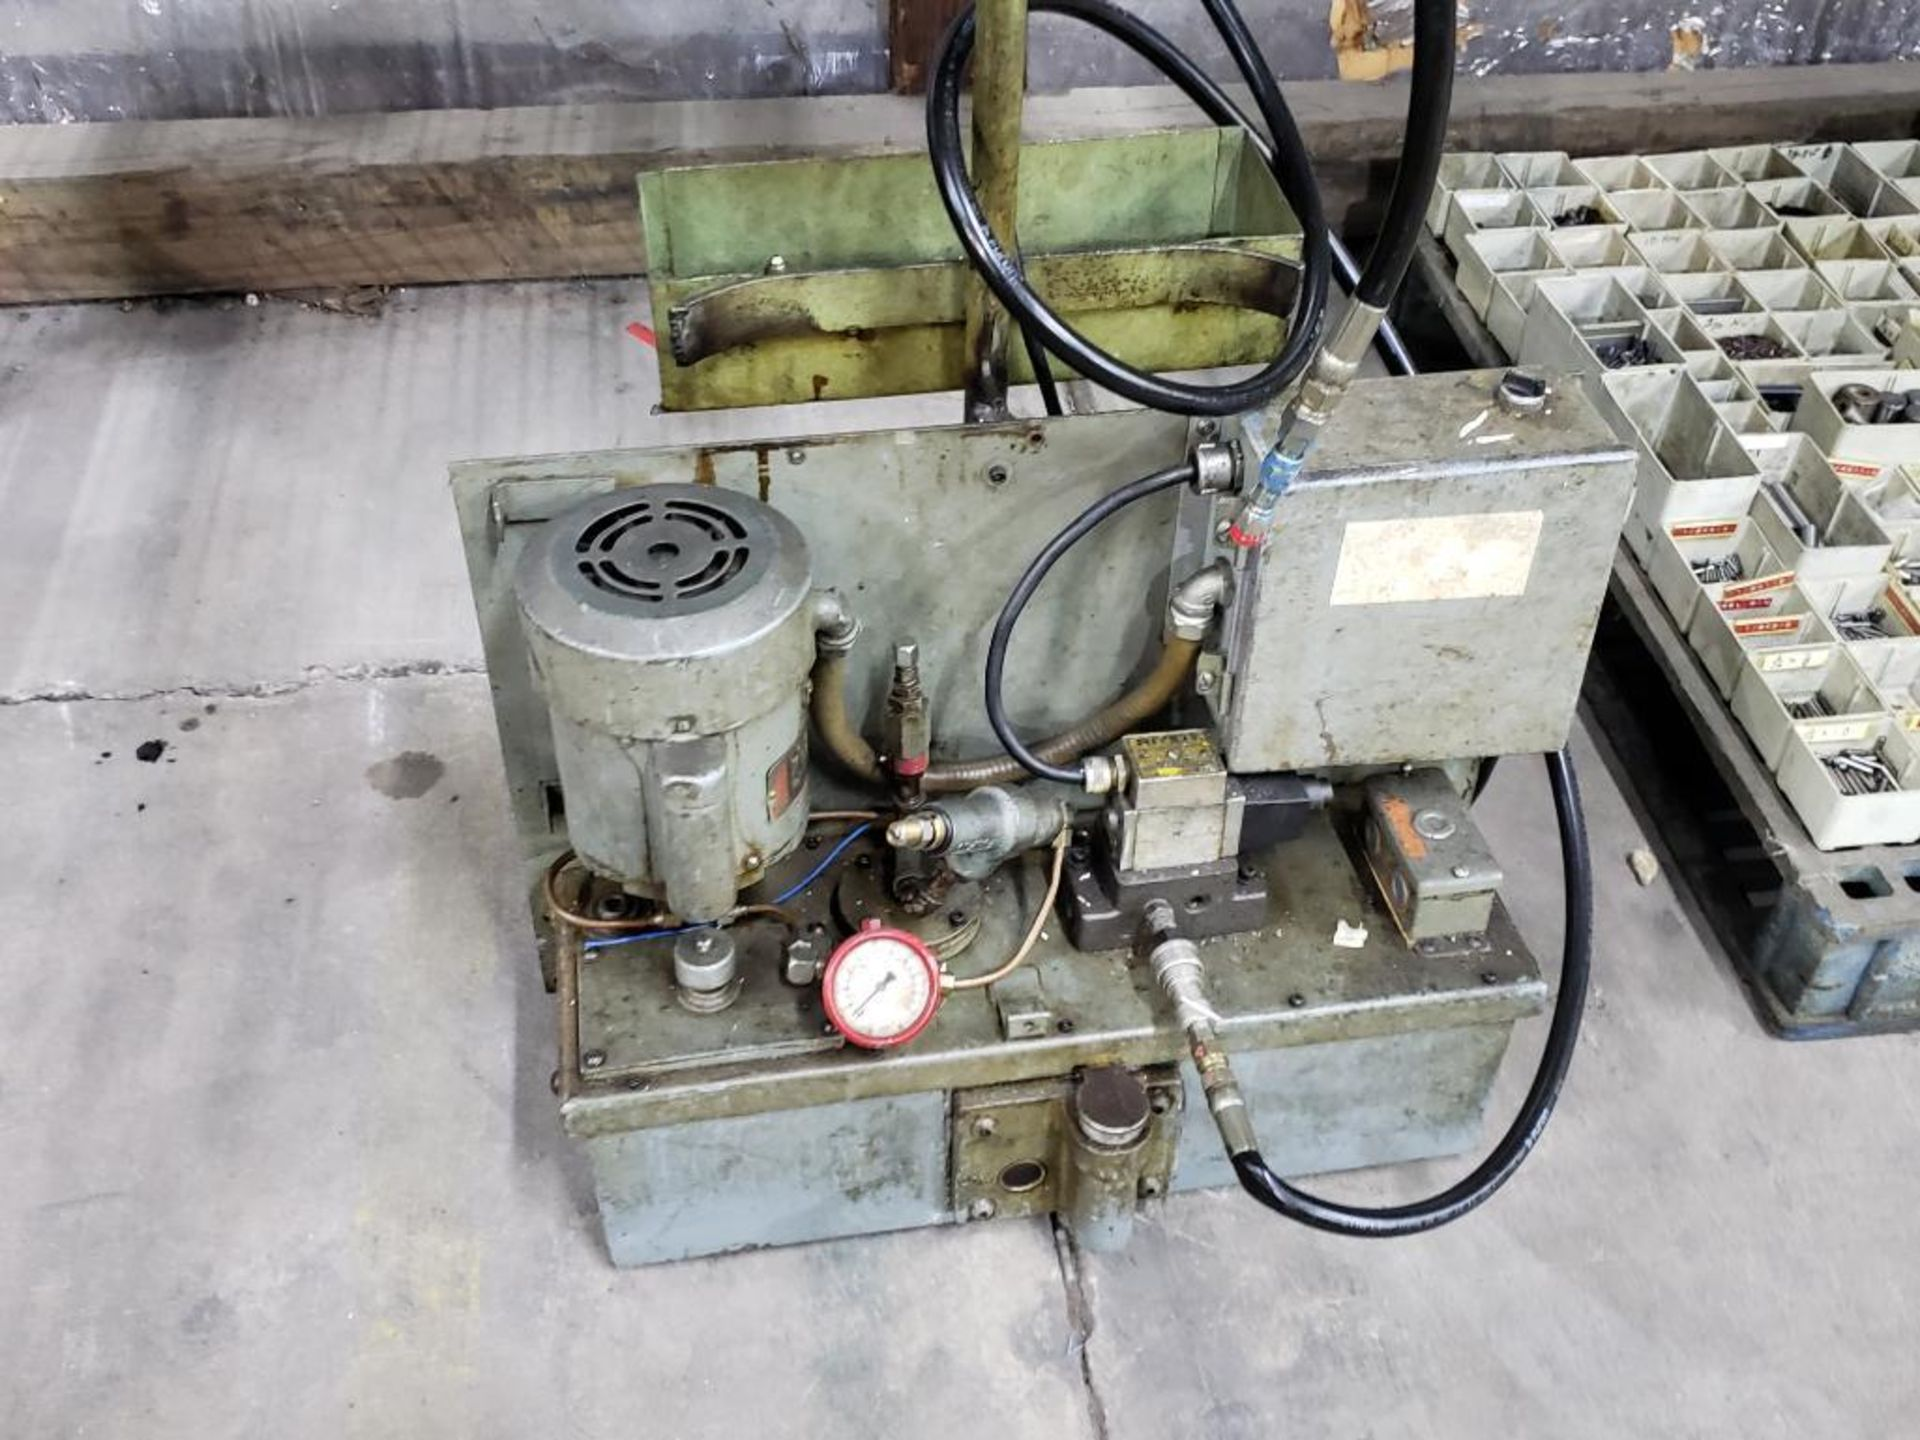 Lot 147 - Hydraulic filtration pump. Single phase 115v.